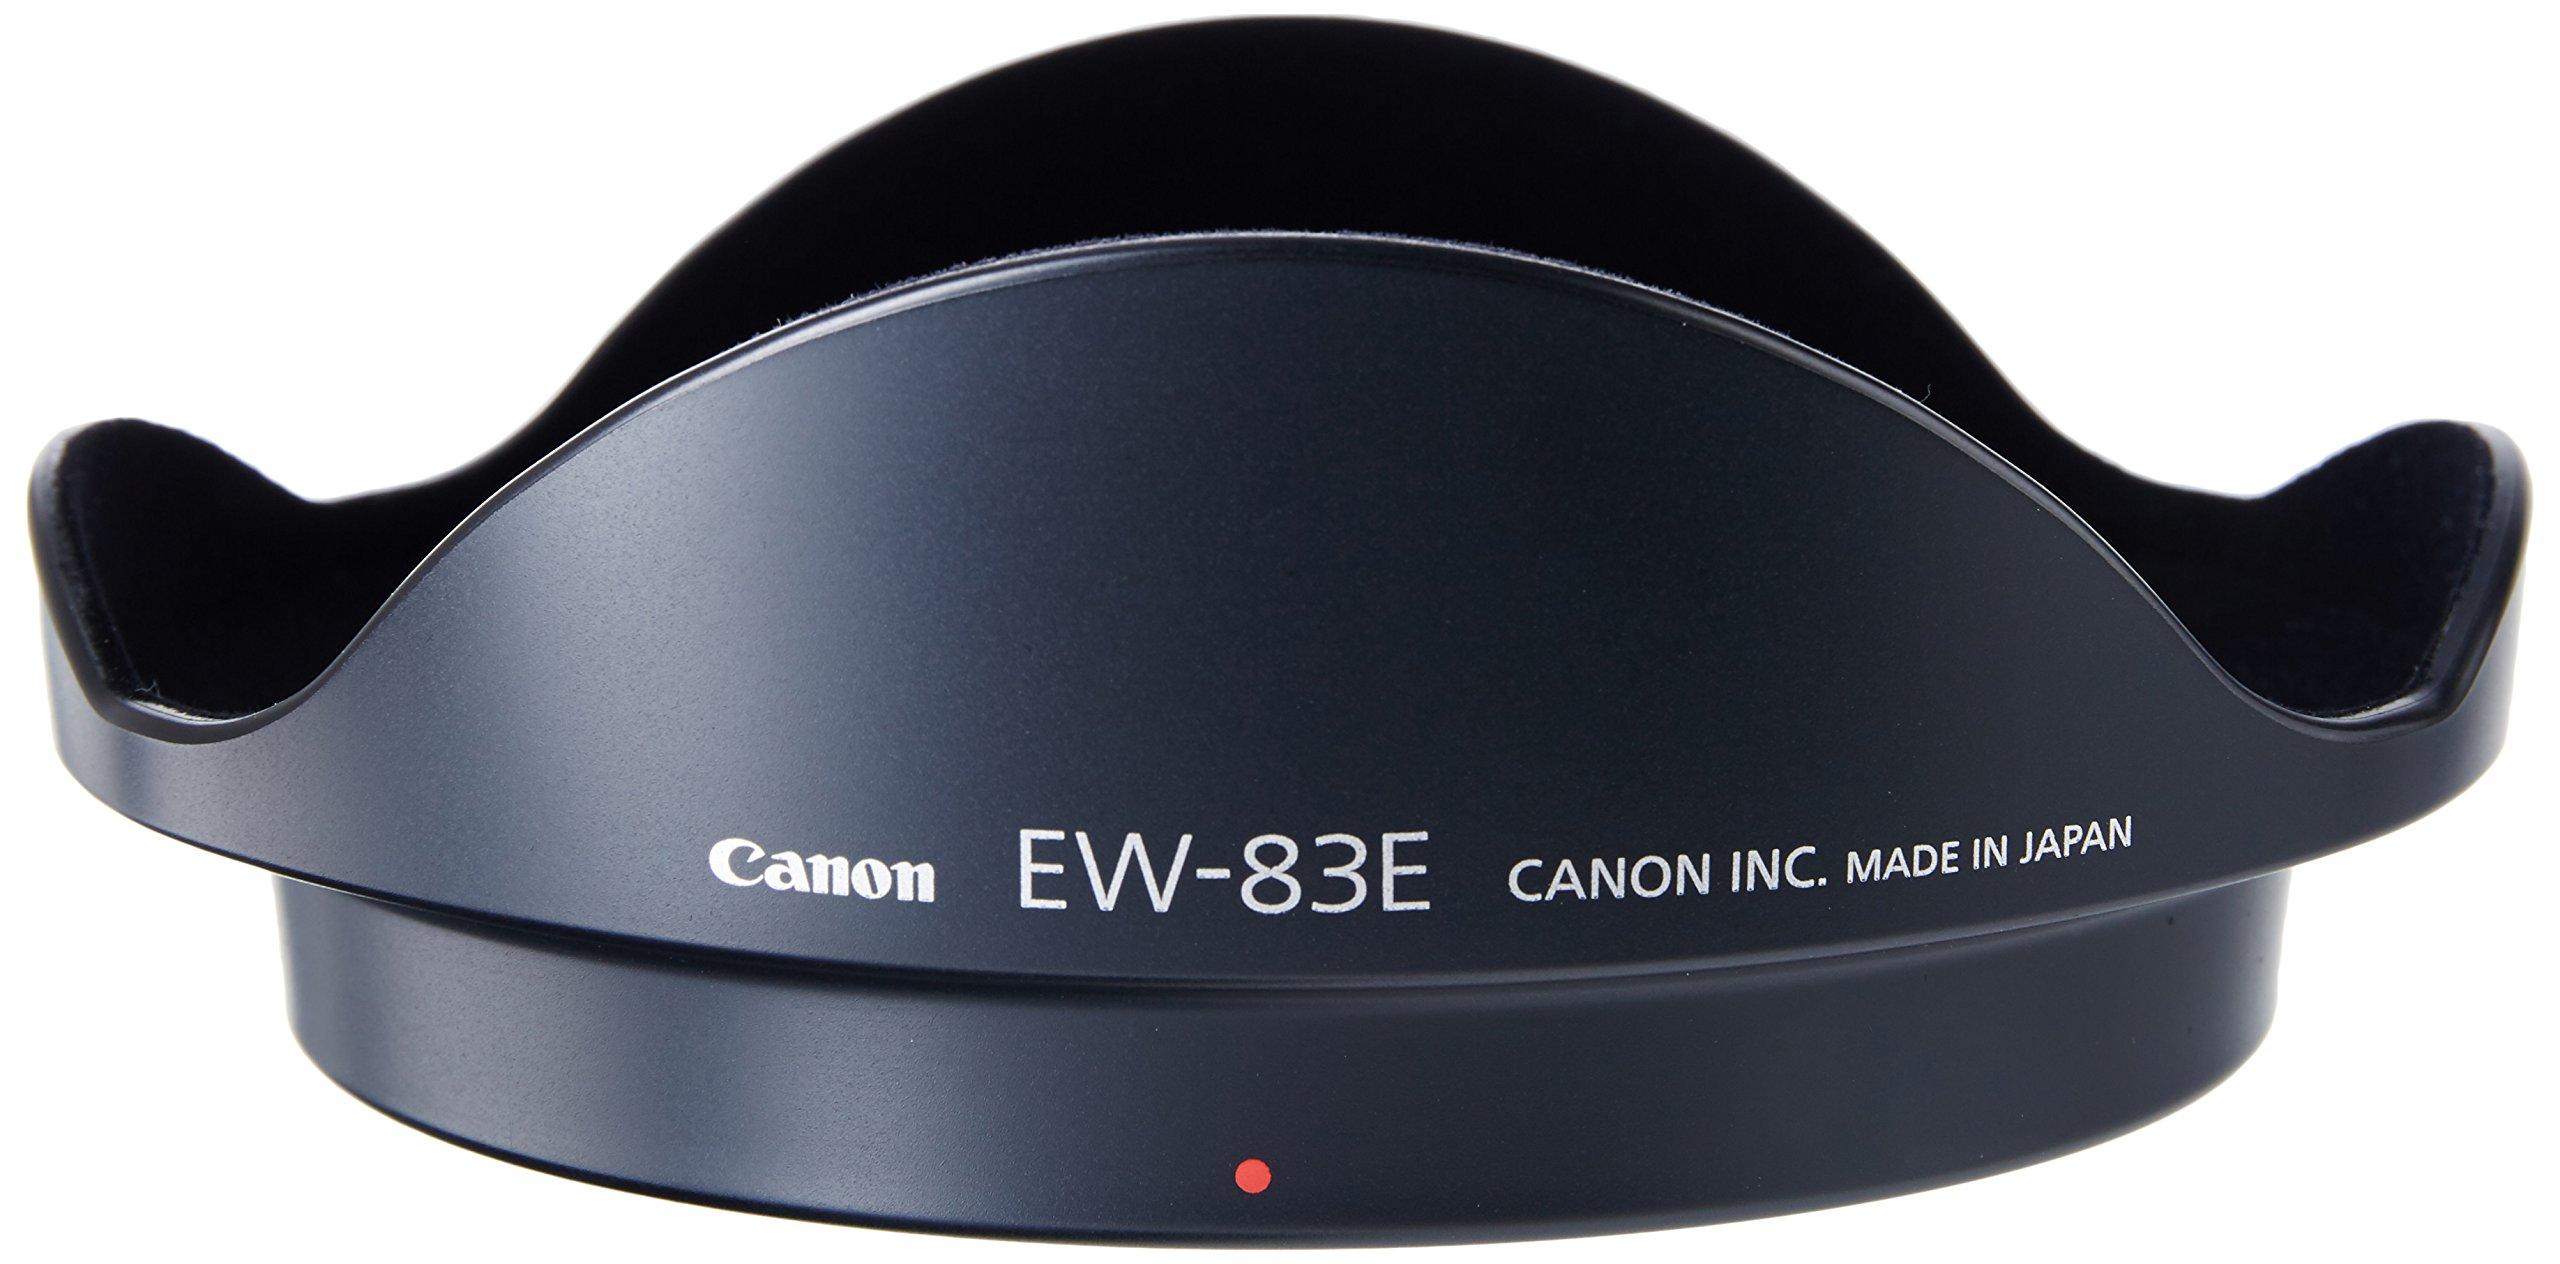 Canon EW83E Lens Hood for EF 16-35mm f/2.8L Canon SLR Lens by Canon